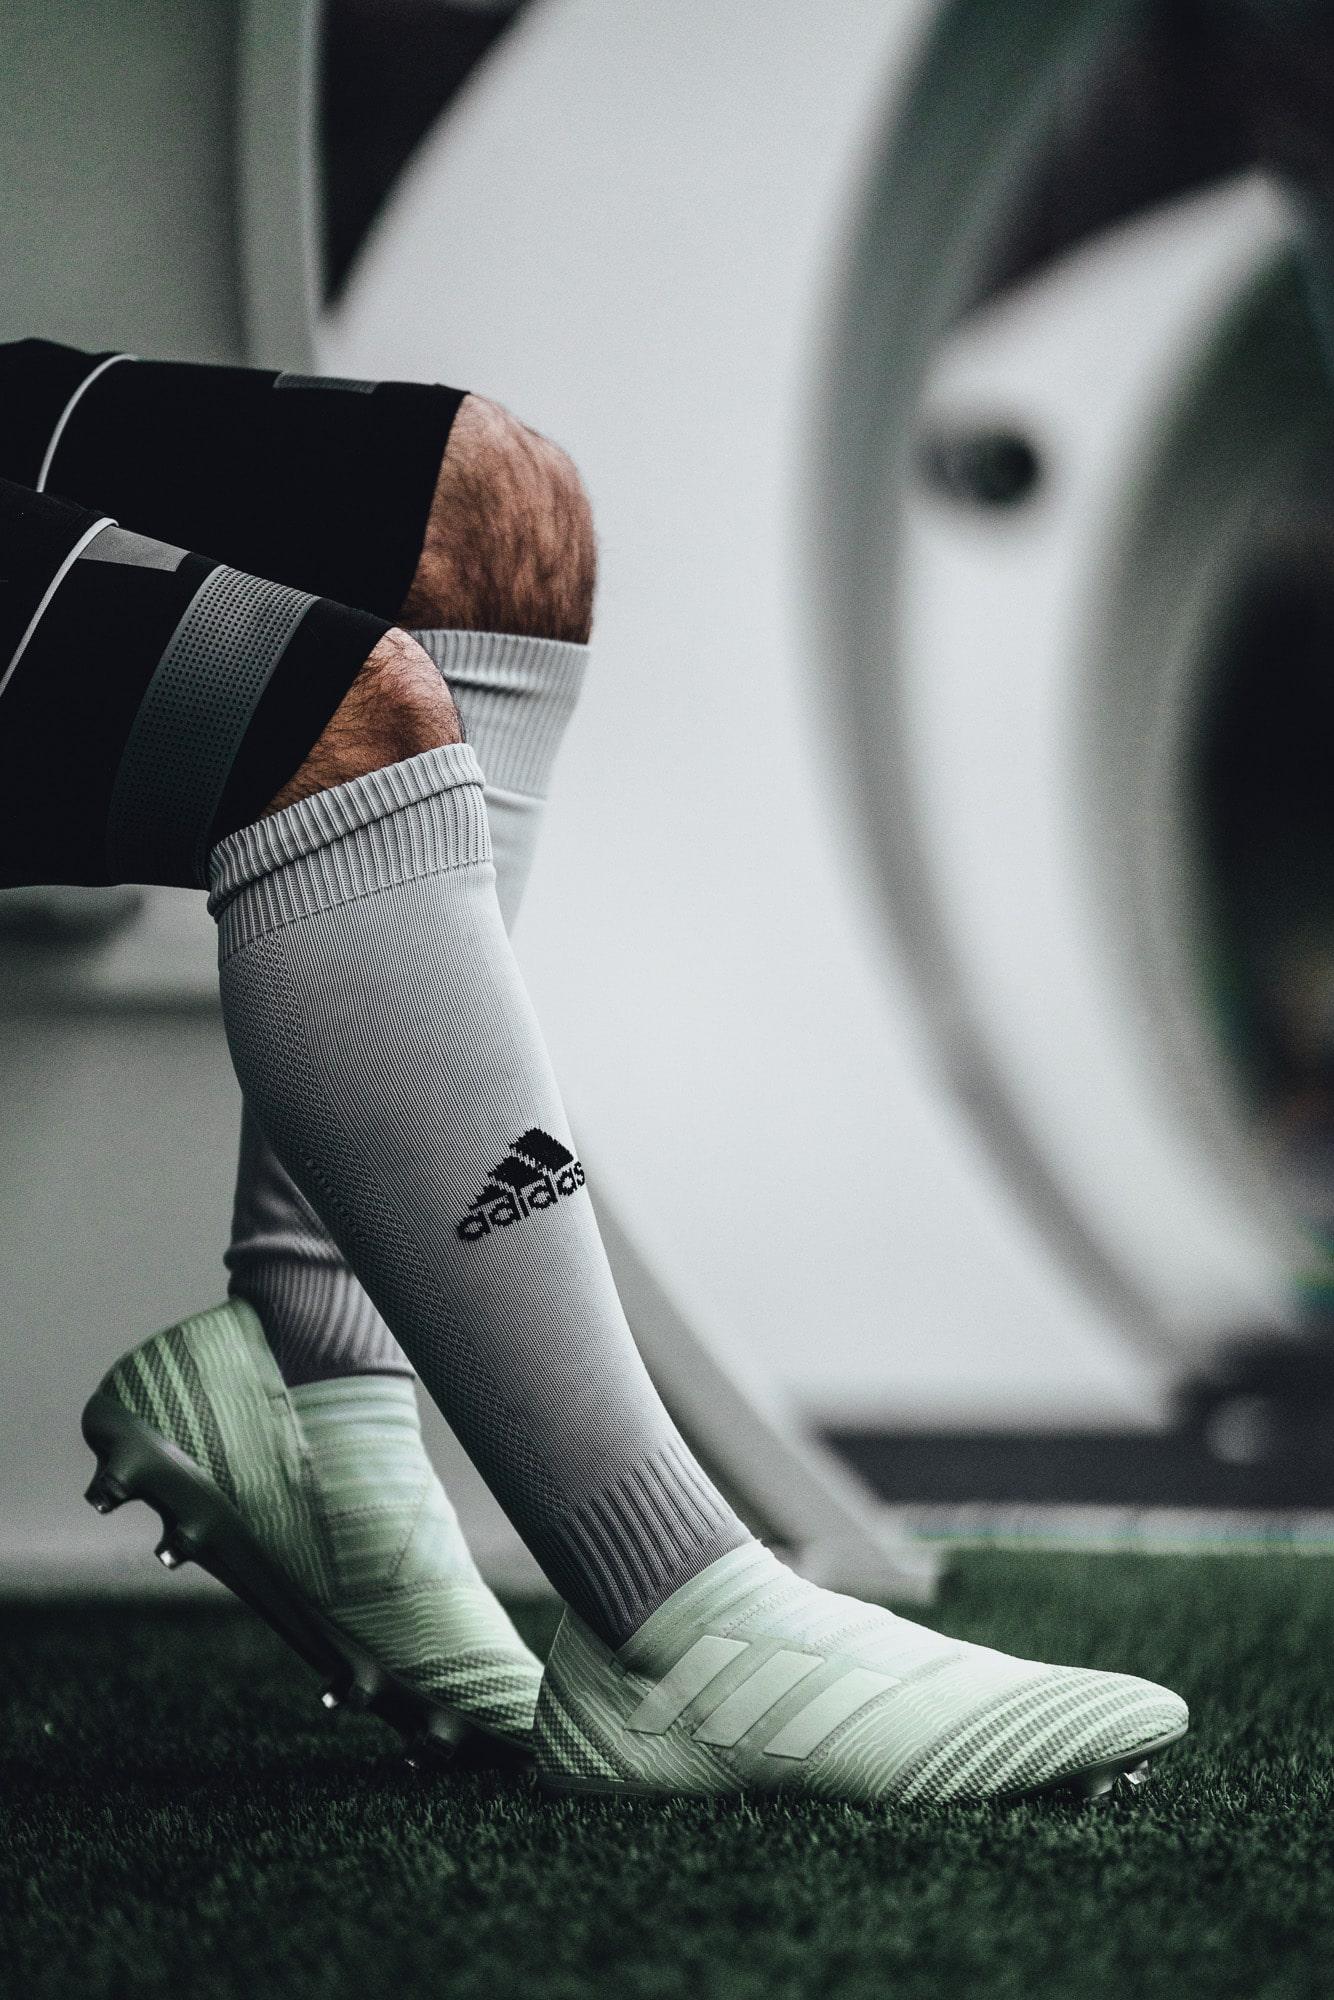 chaussure-football-adidas-nemeziz-deadly-strike-mars-2018